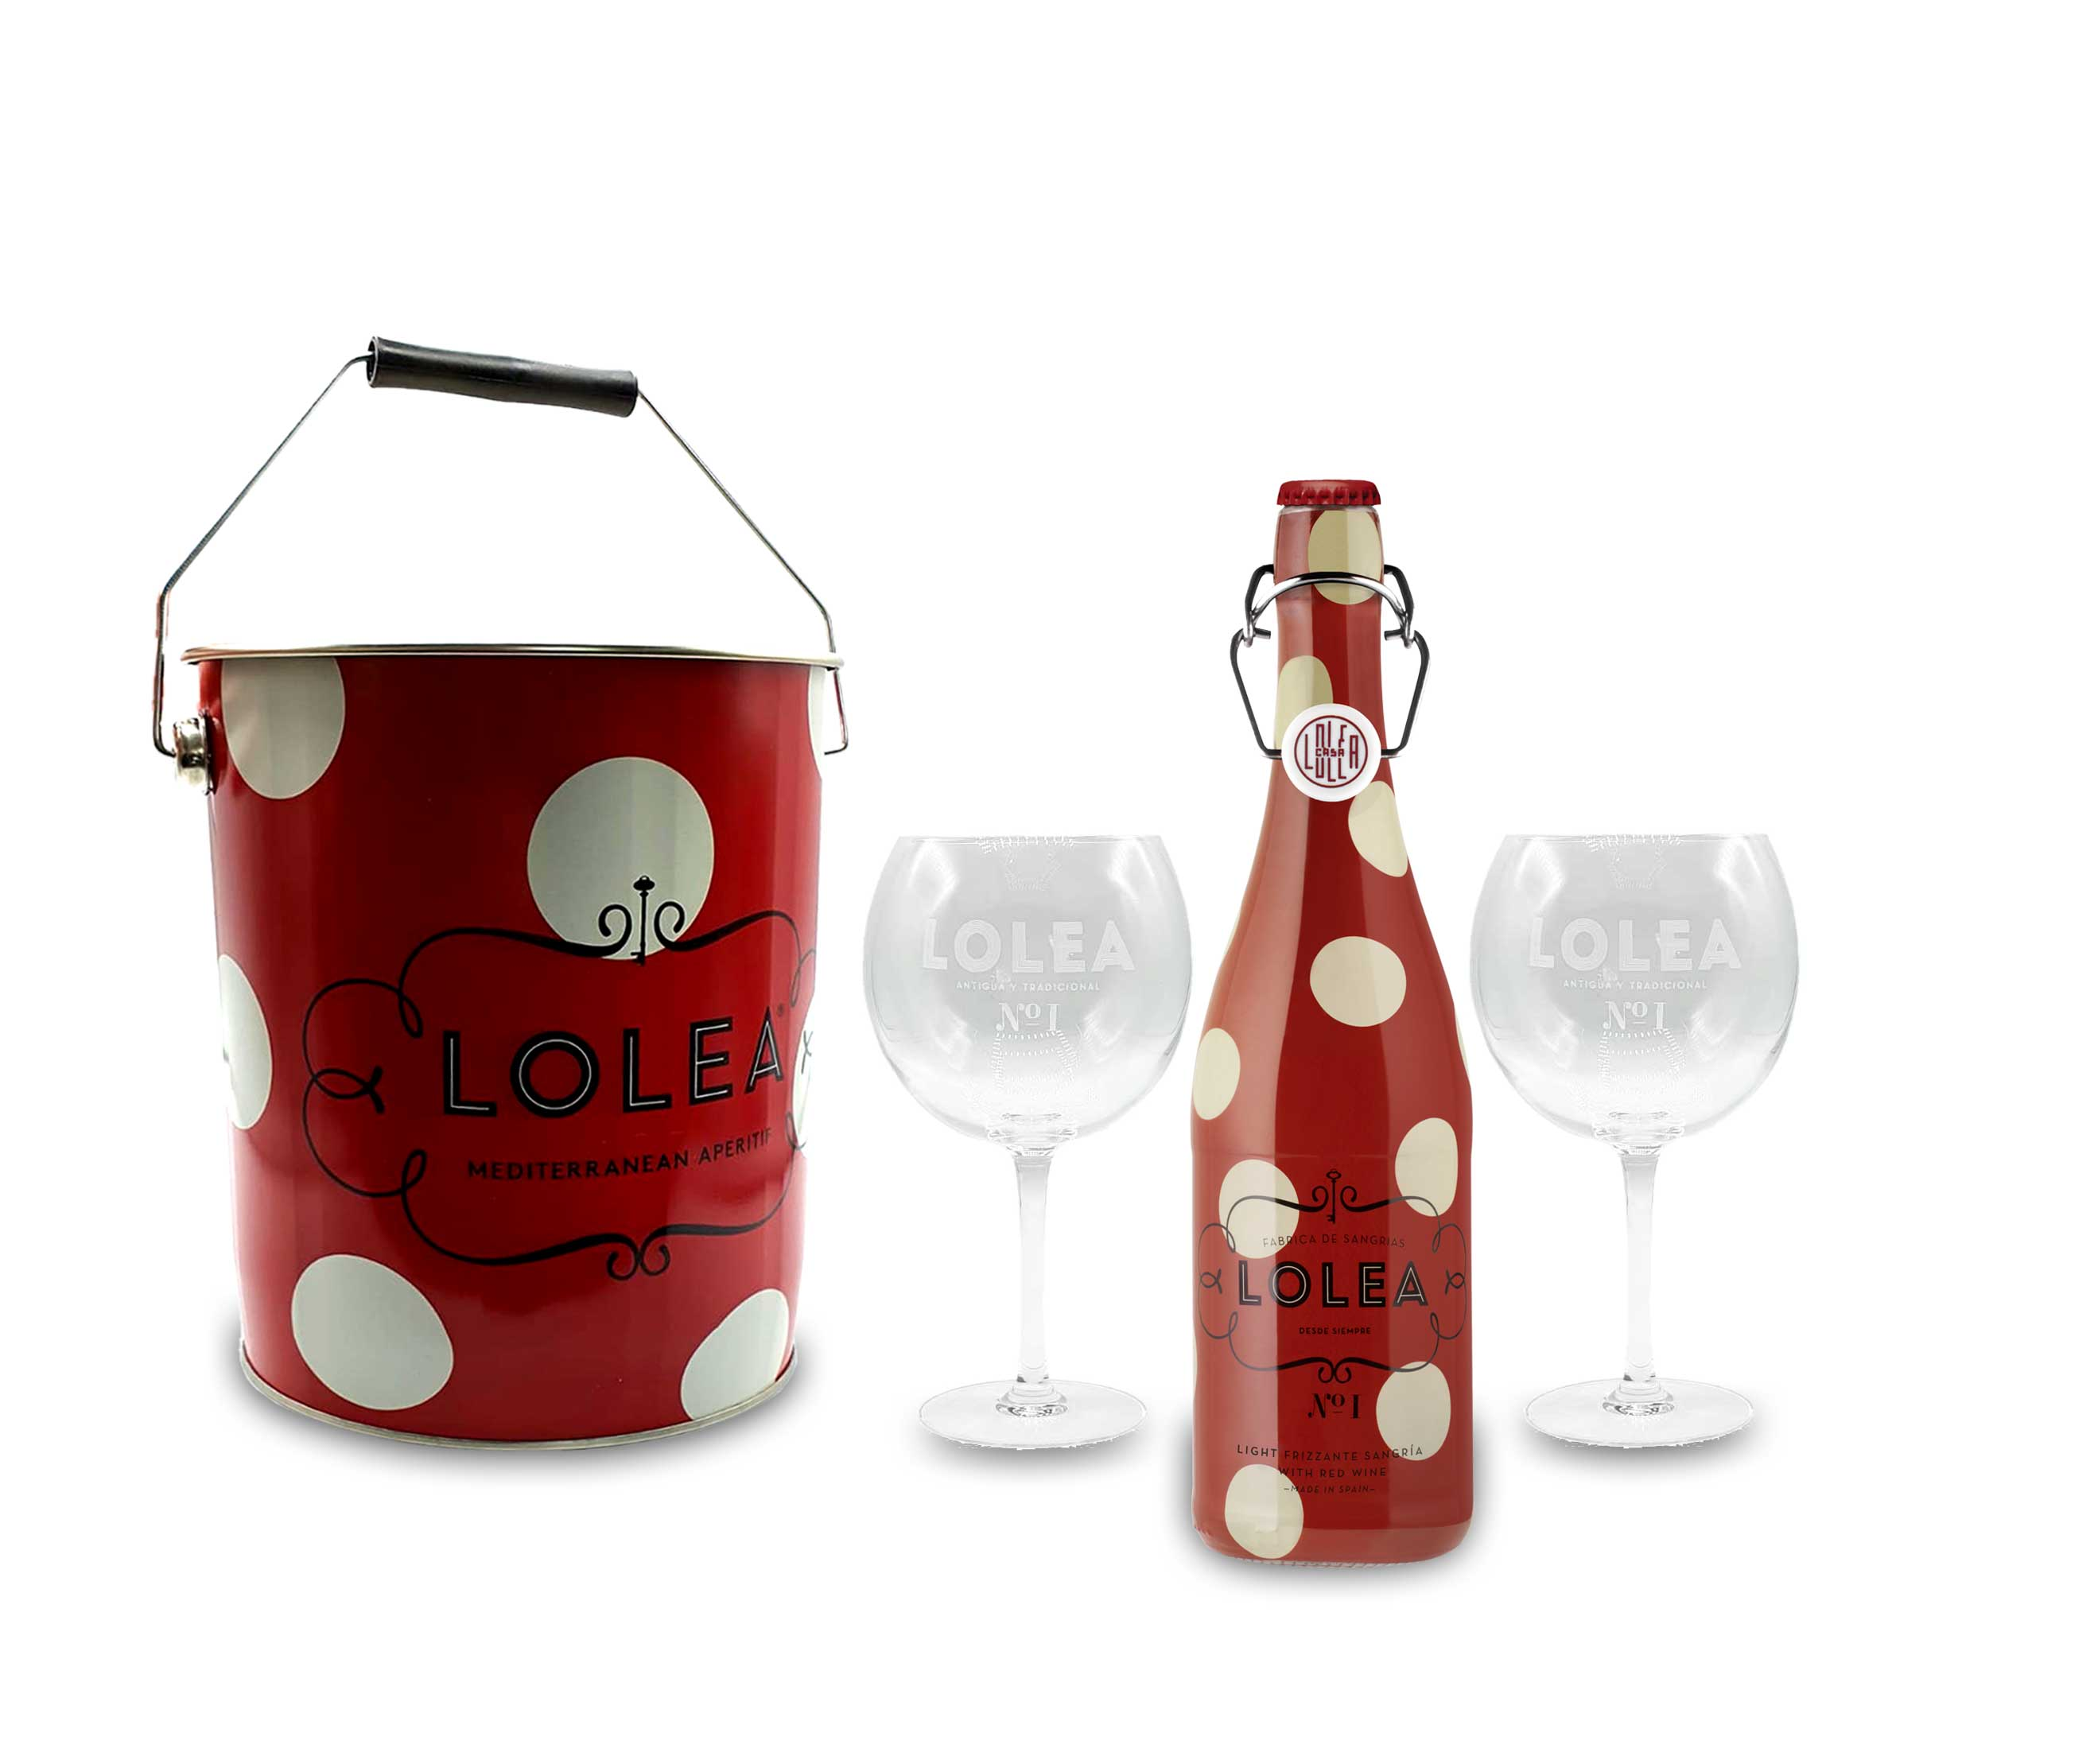 Lolea Set - Kühler mit Henkel + 2 Ballongläser + Lolea Sangria N°1 ROT 0,75L (7% Vol) Rotwein Sangria Cabernet Sauvignon, Tempranillo Trauben- [Enthält Sulfite]